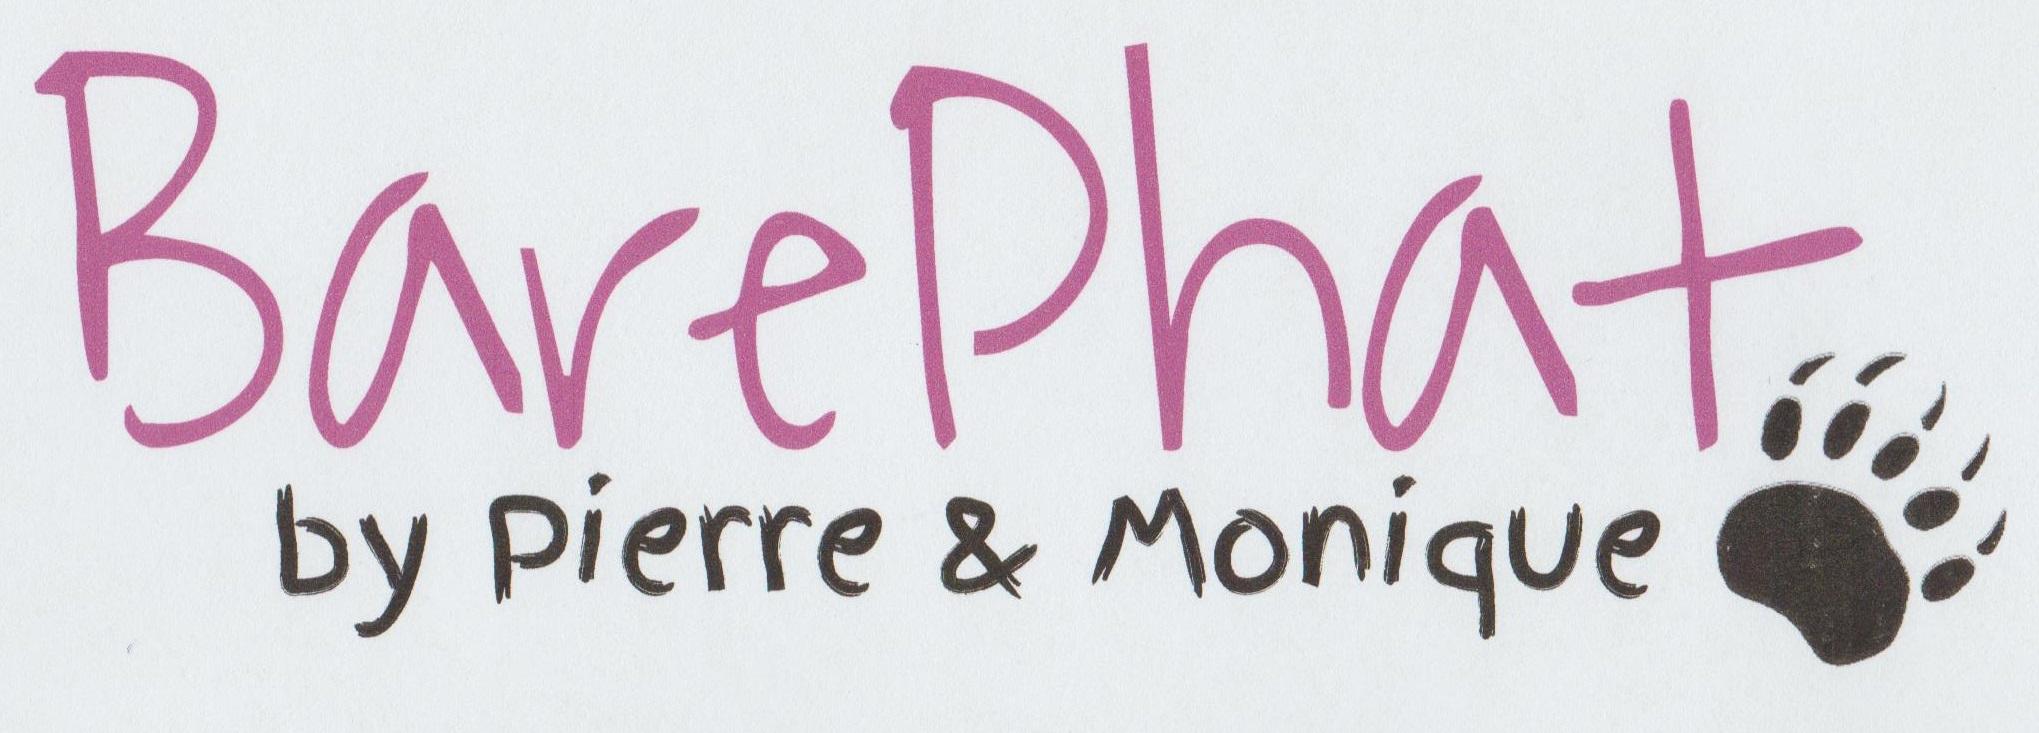 BarePhat by Pierre & Monique